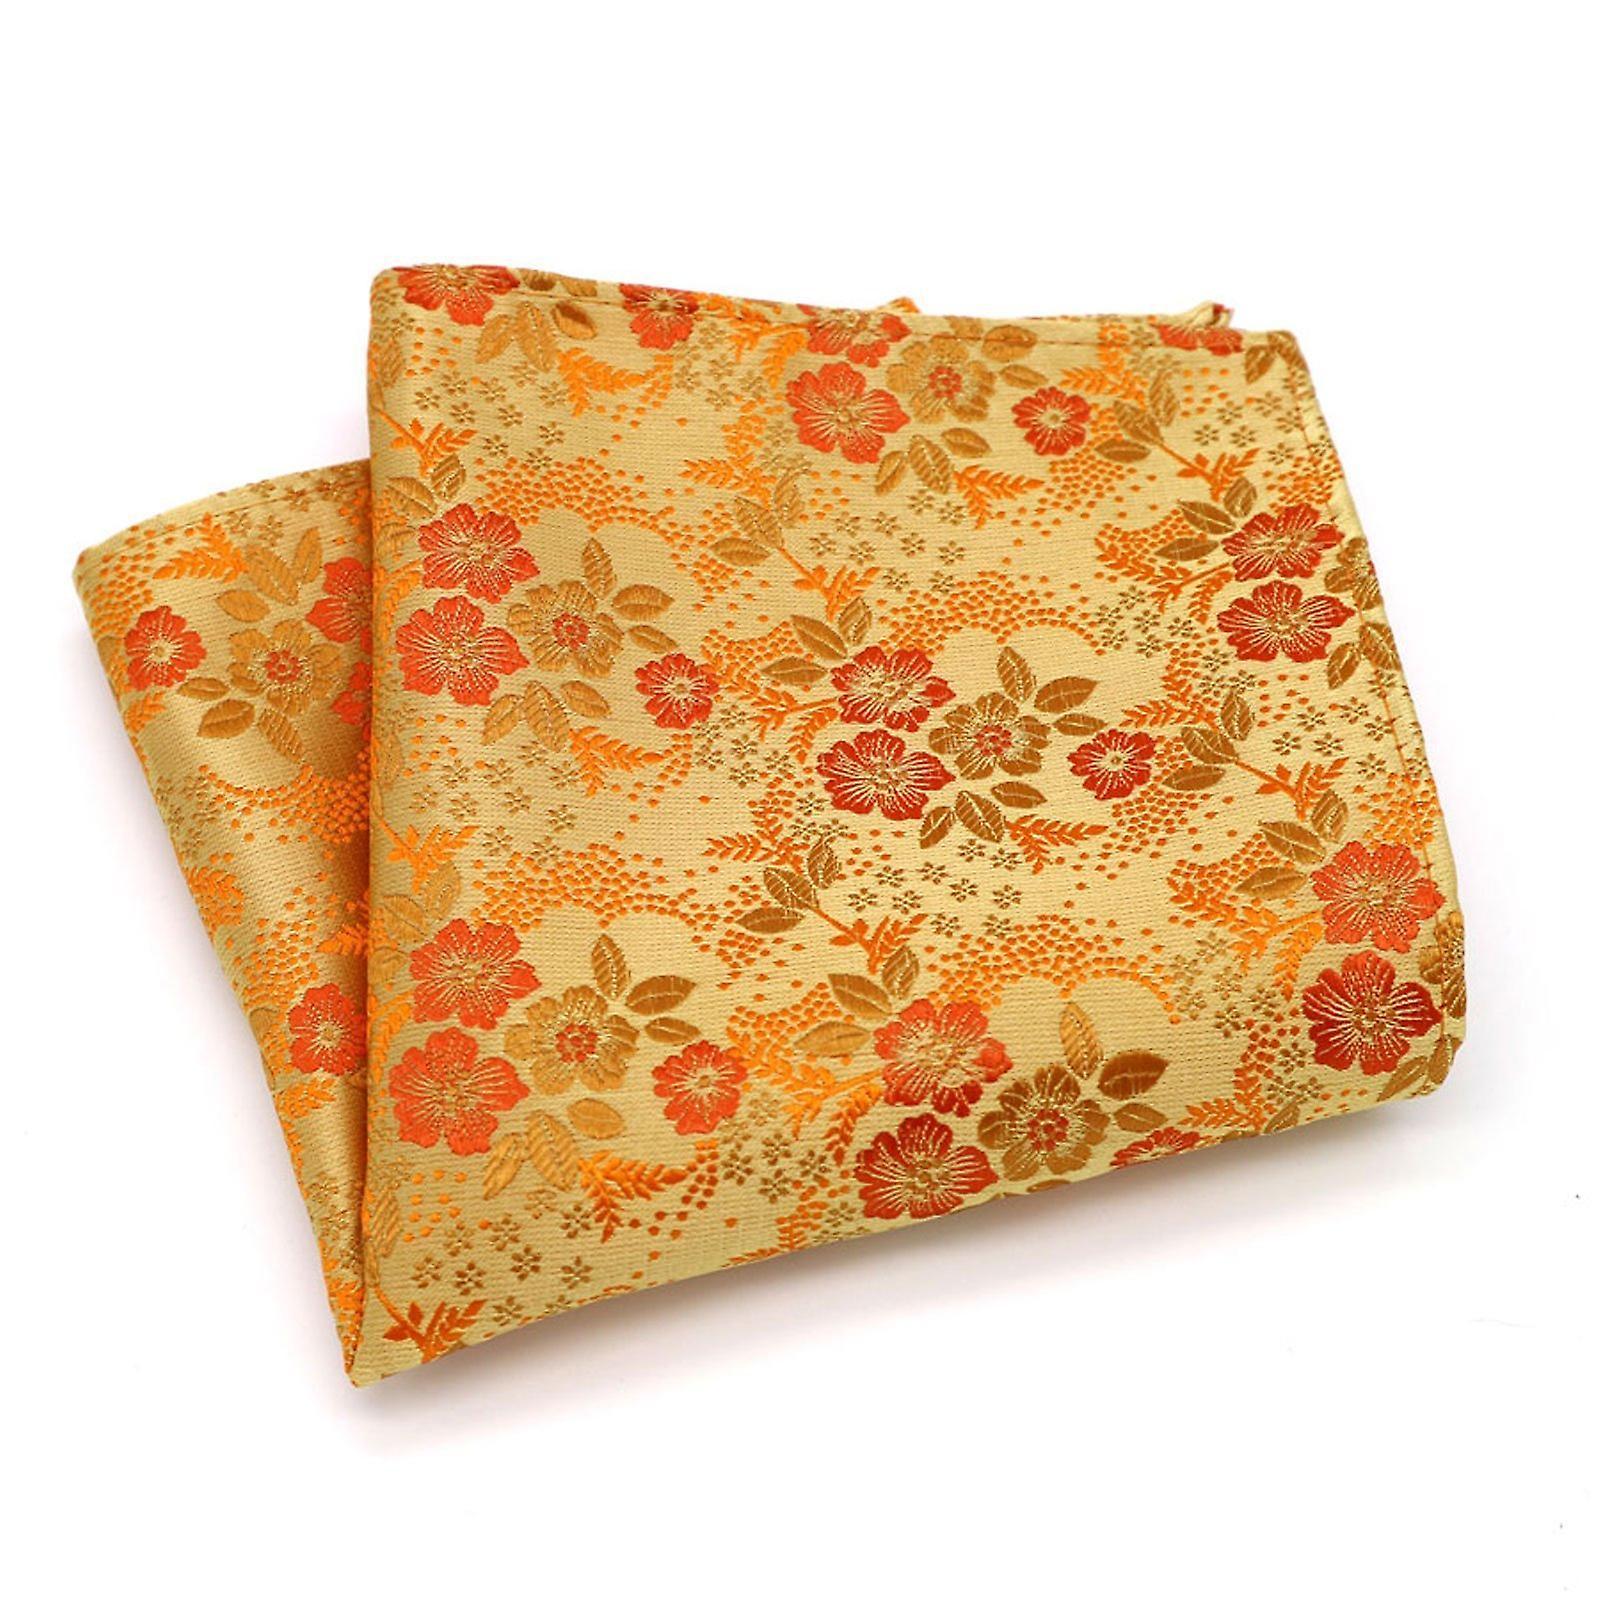 Orange & red autumn wedding men's floral pocket square